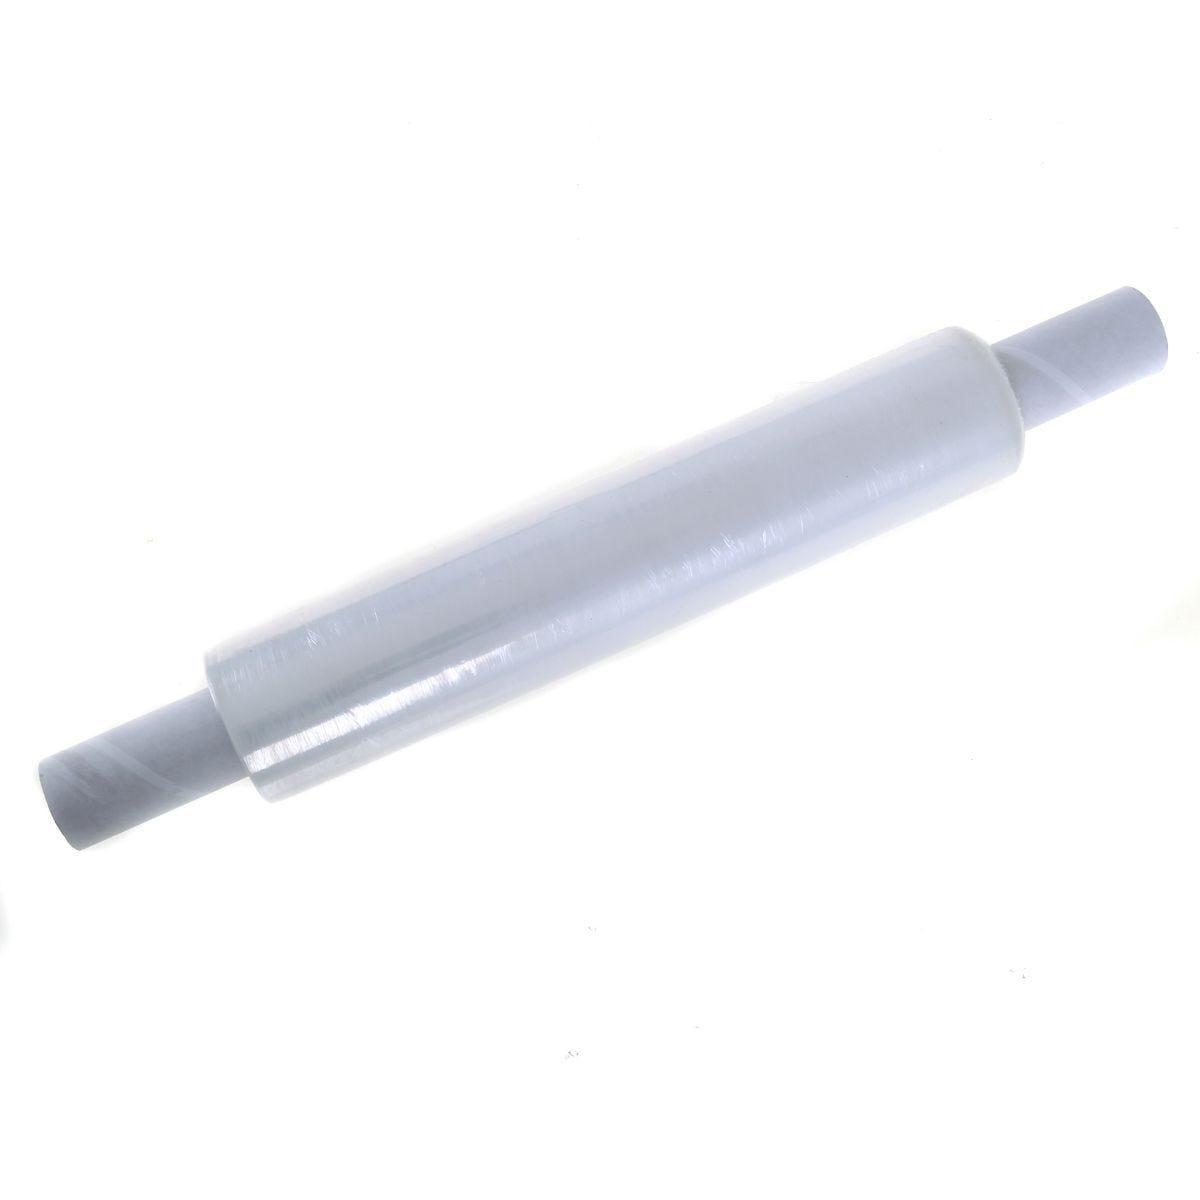 Flexocare Budget Stretchwrap 14micron 400mmx250m Pack of 6